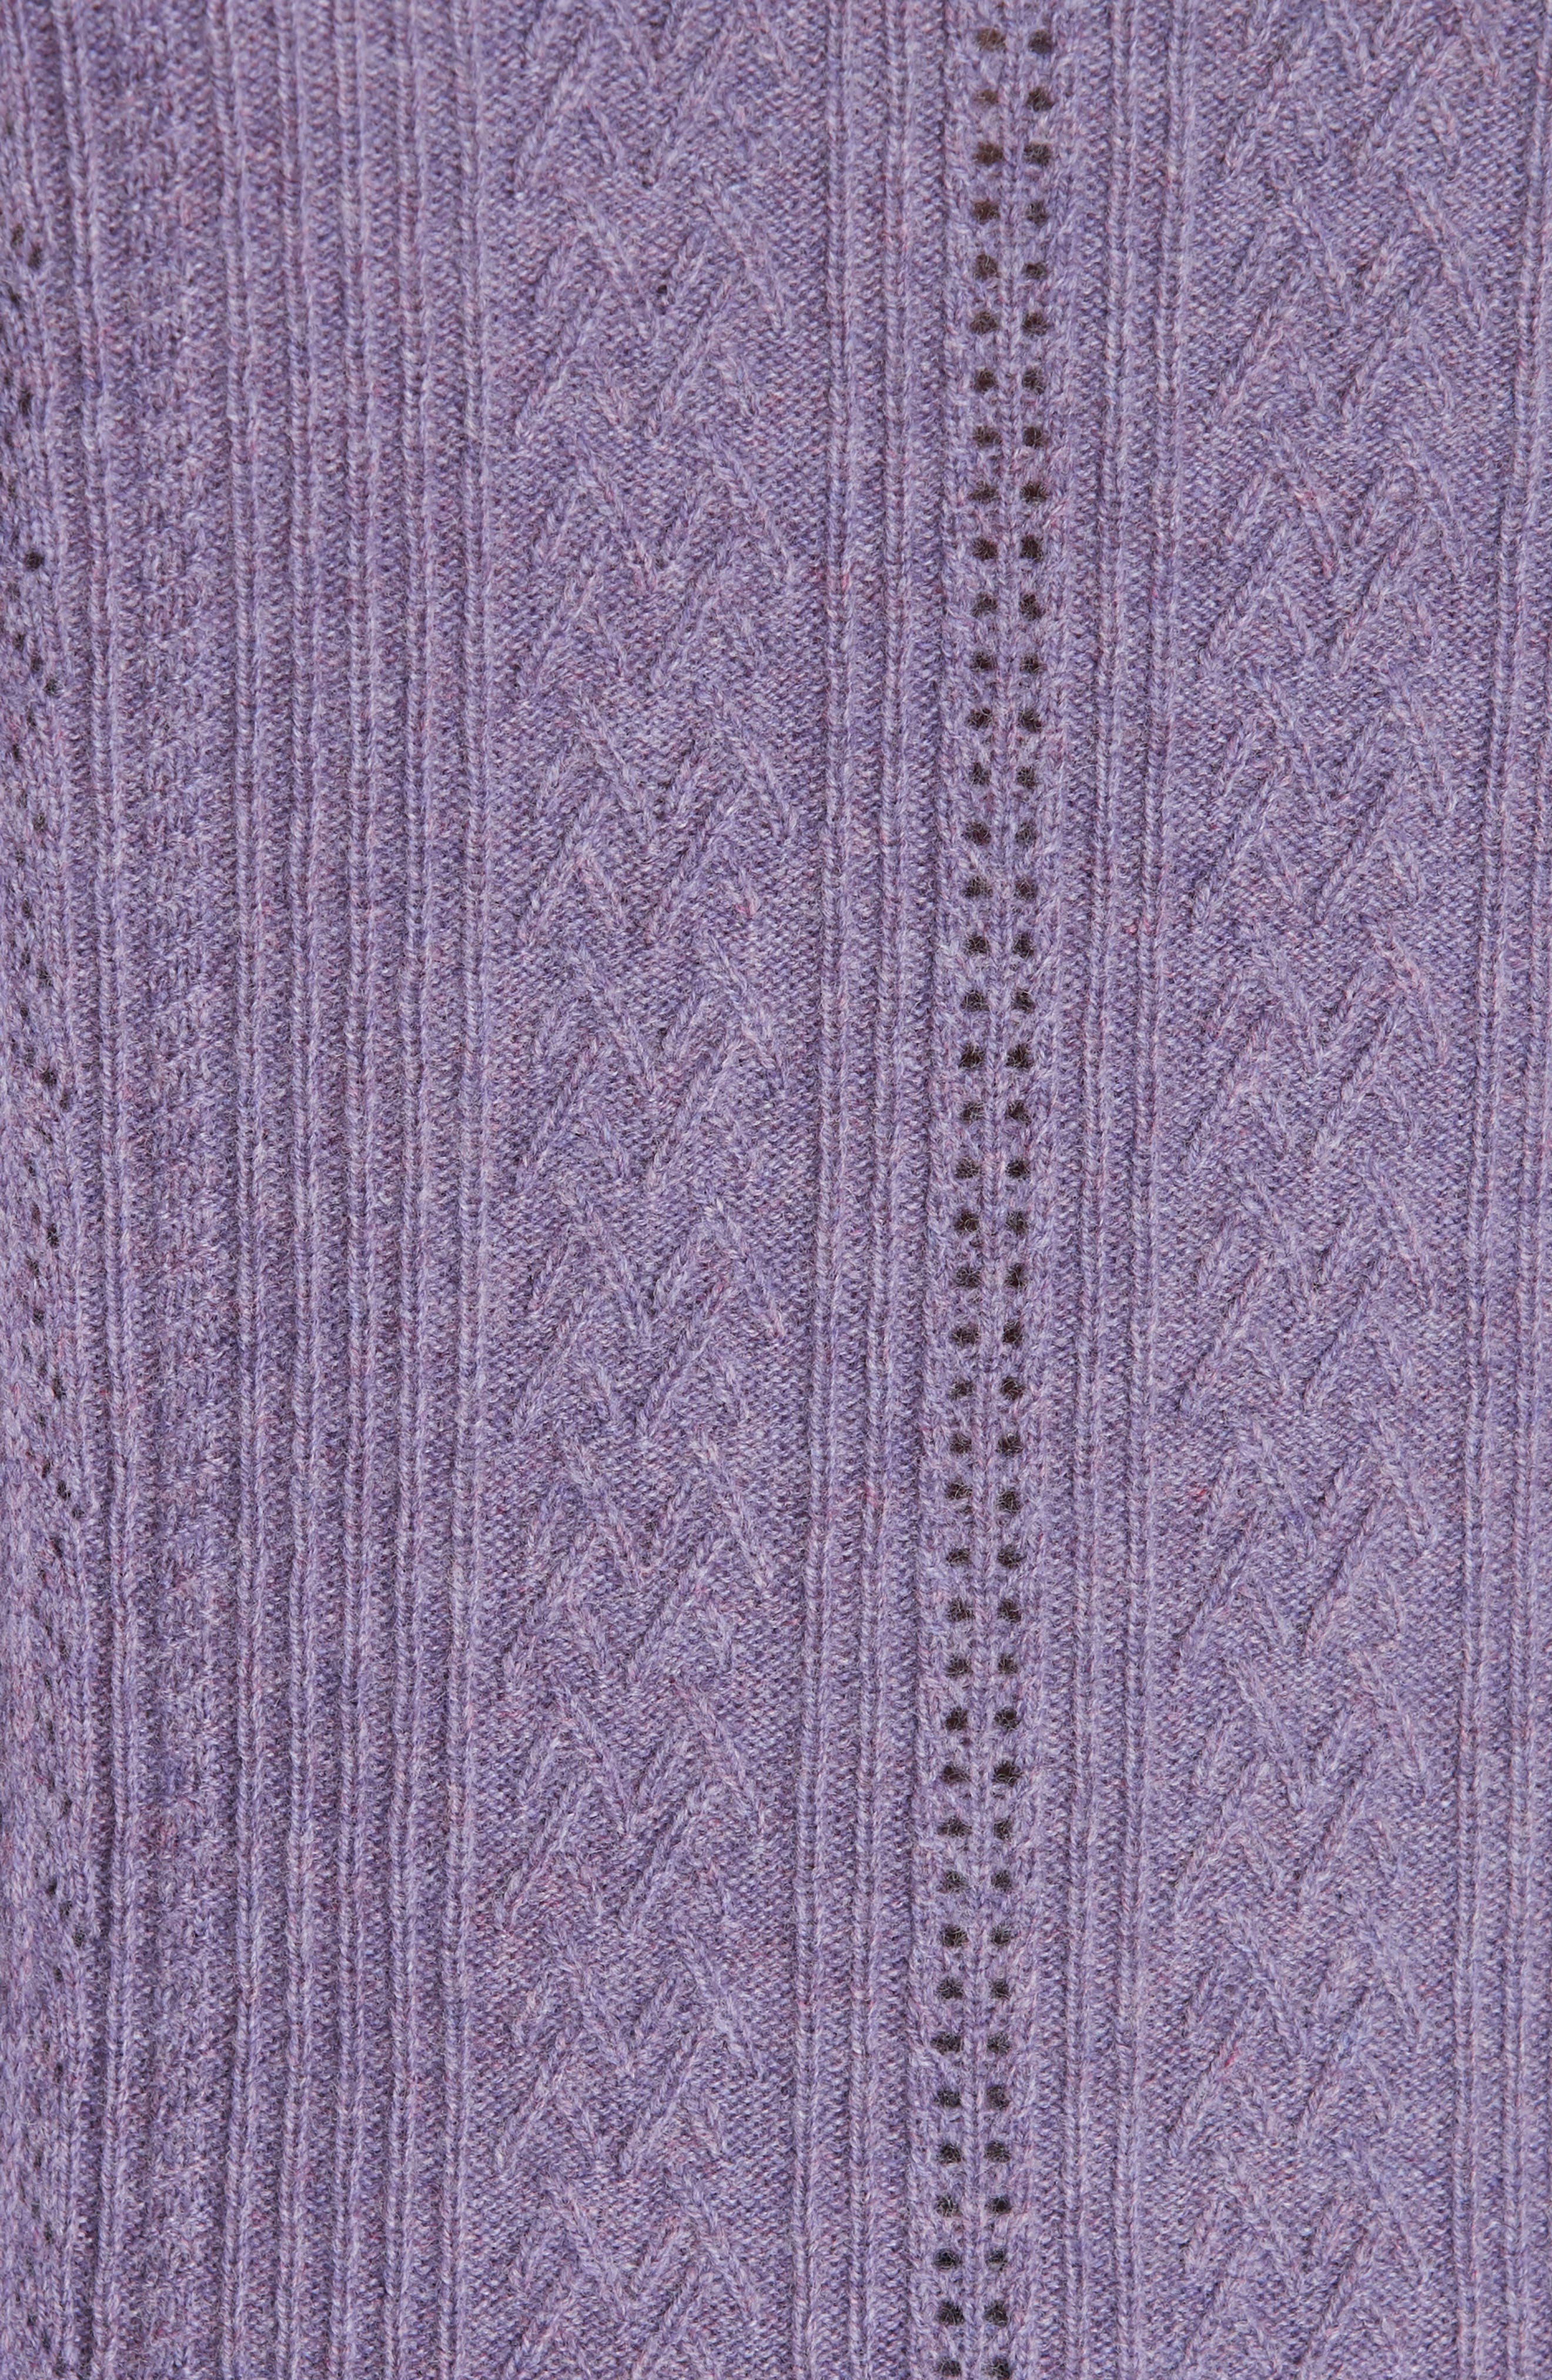 POLO RALPH LAUREN,                             Ruffle Detail Pointelle Sweater,                             Alternate thumbnail 5, color,                             500